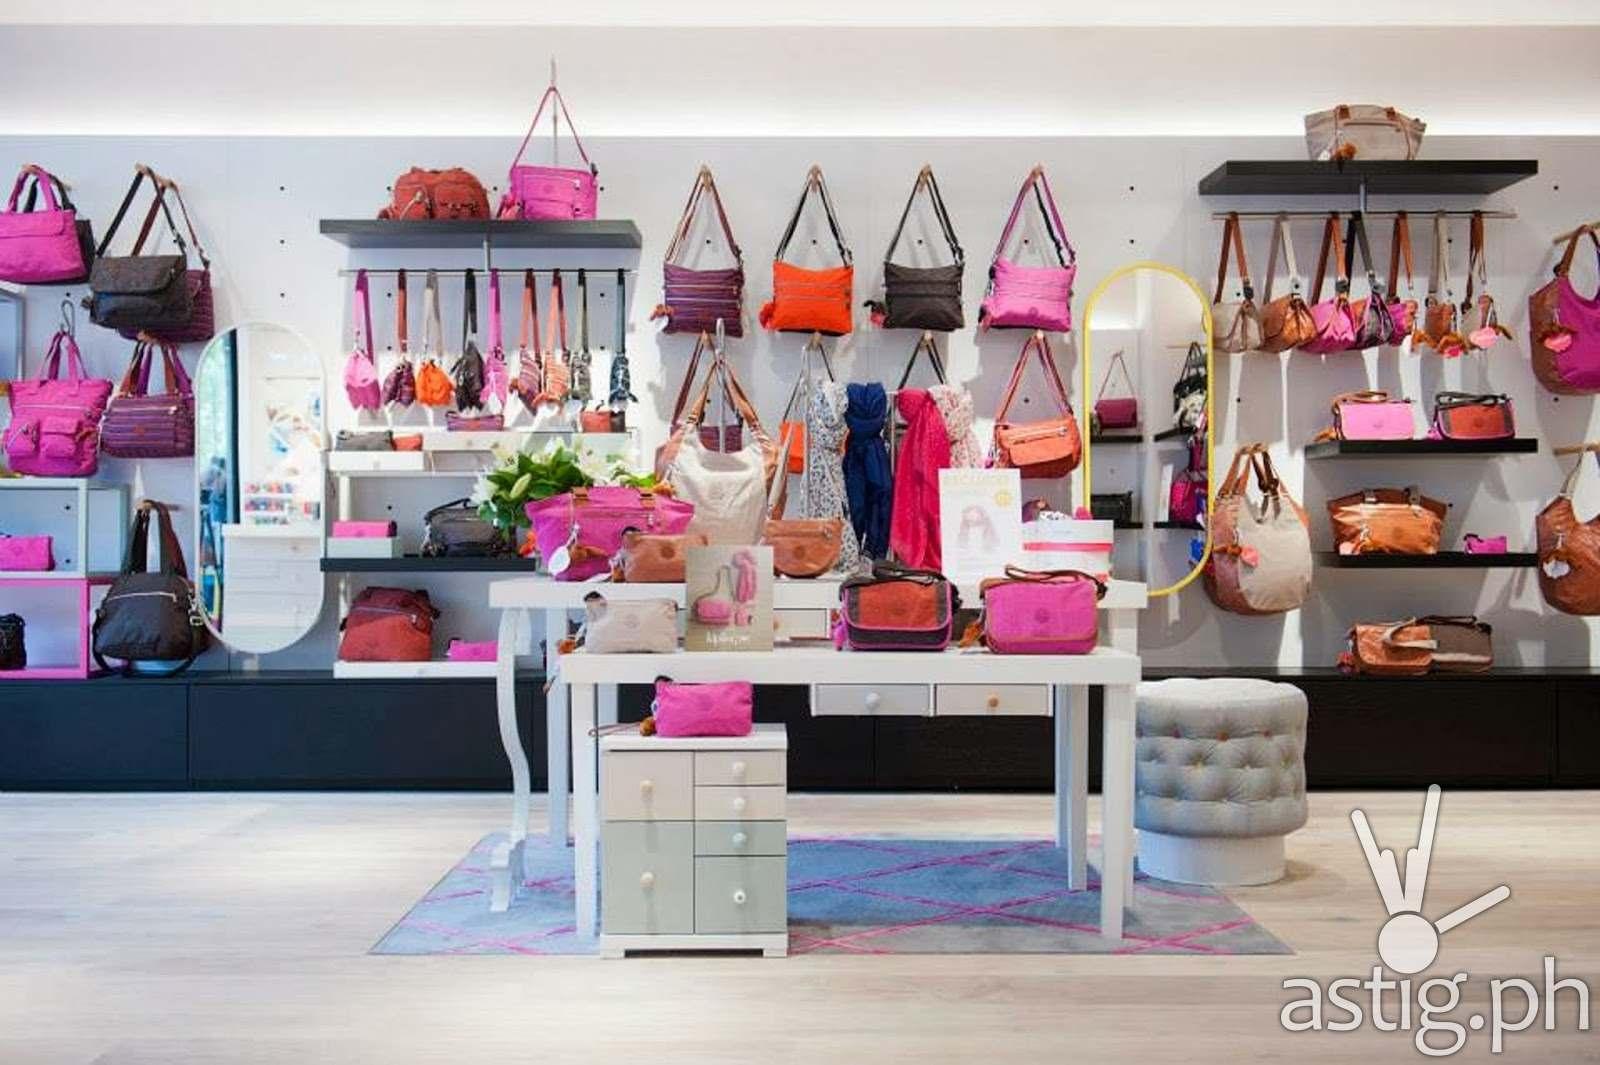 House of Kipling - applying domestic charm to retail